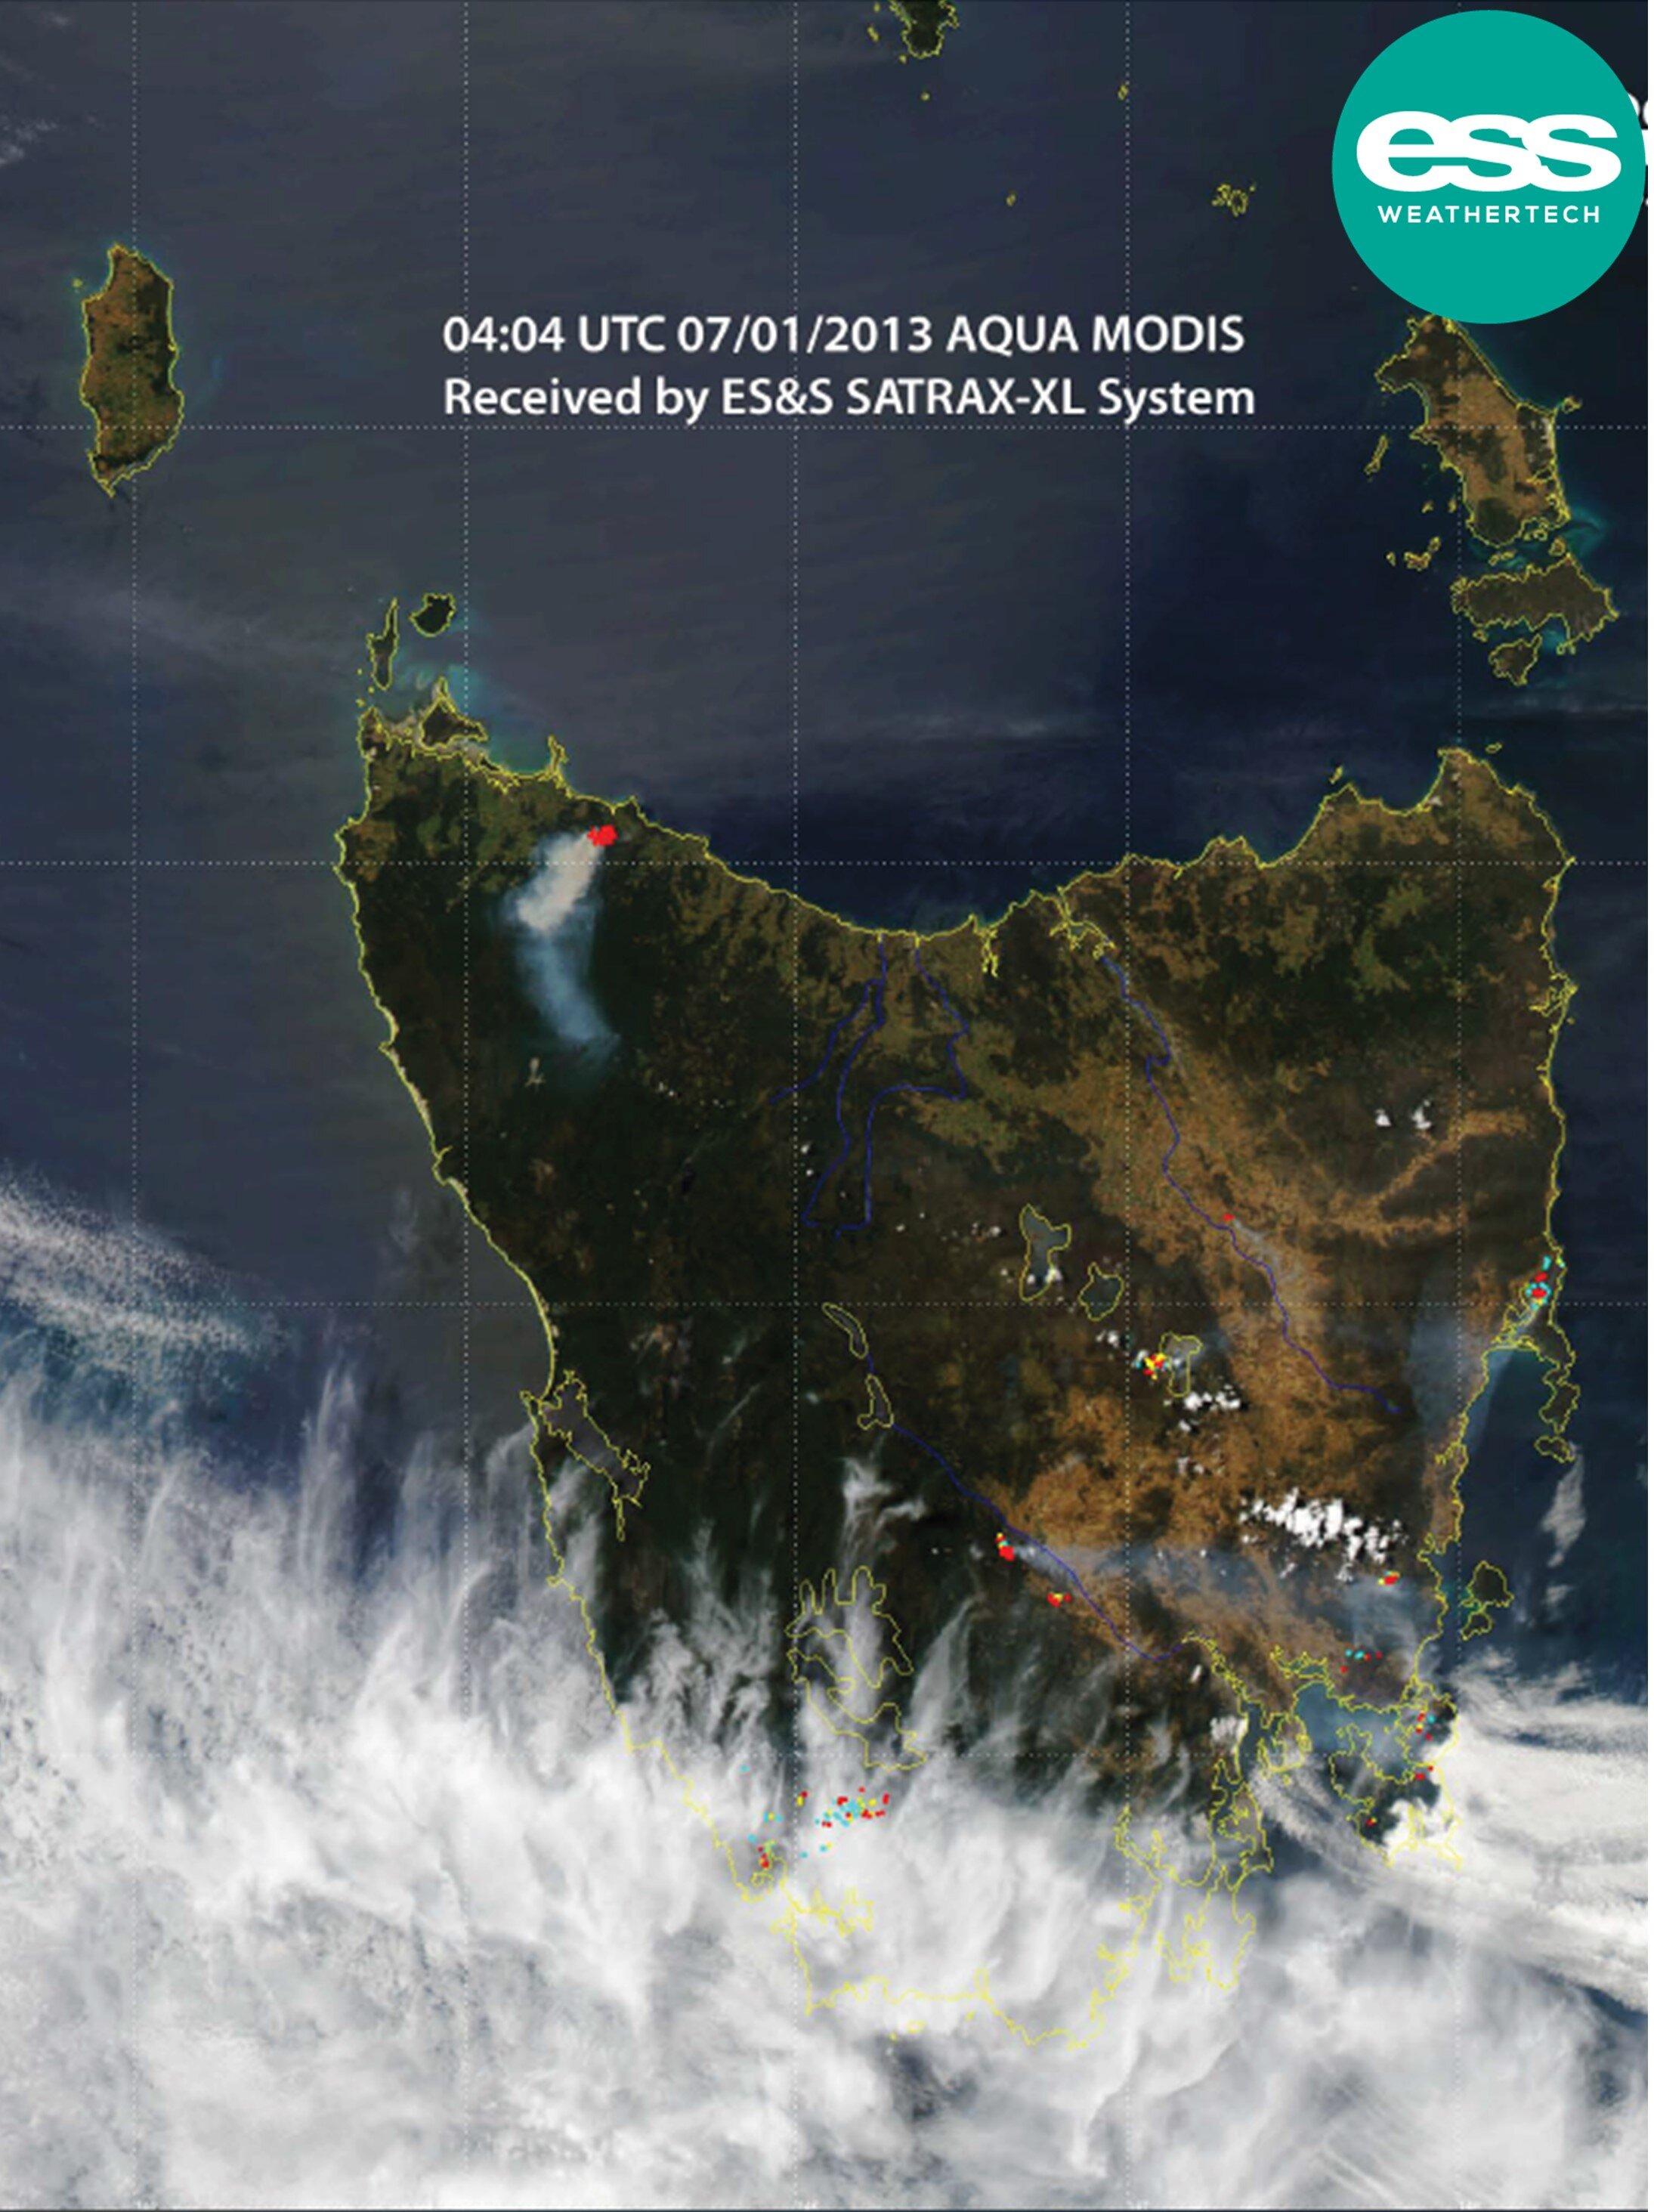 Satellite ground station data on tasmanian fires in 2013